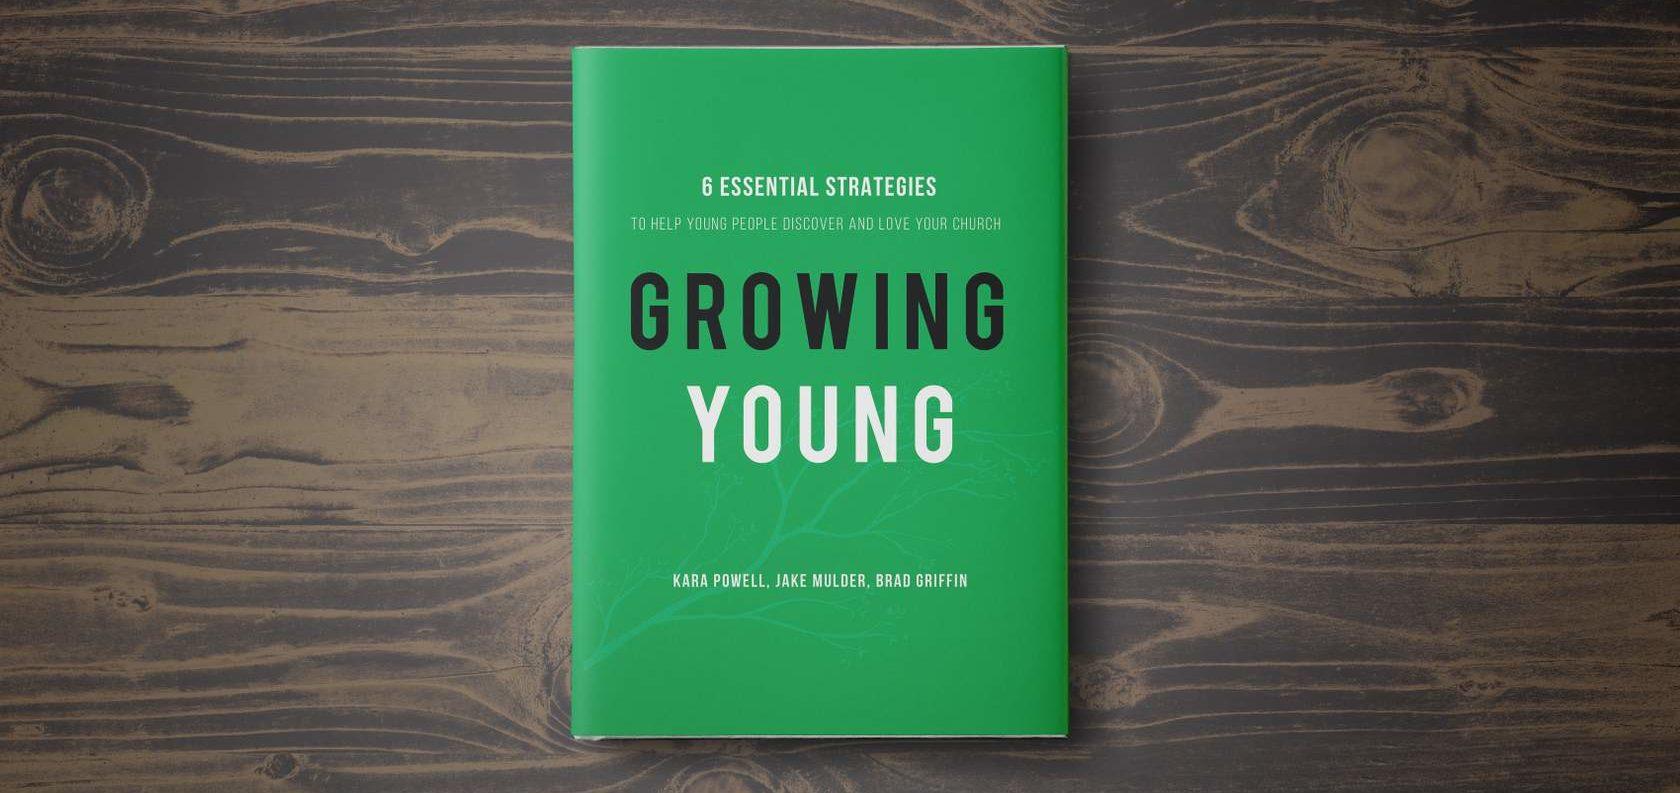 GrowingYoungEssentials